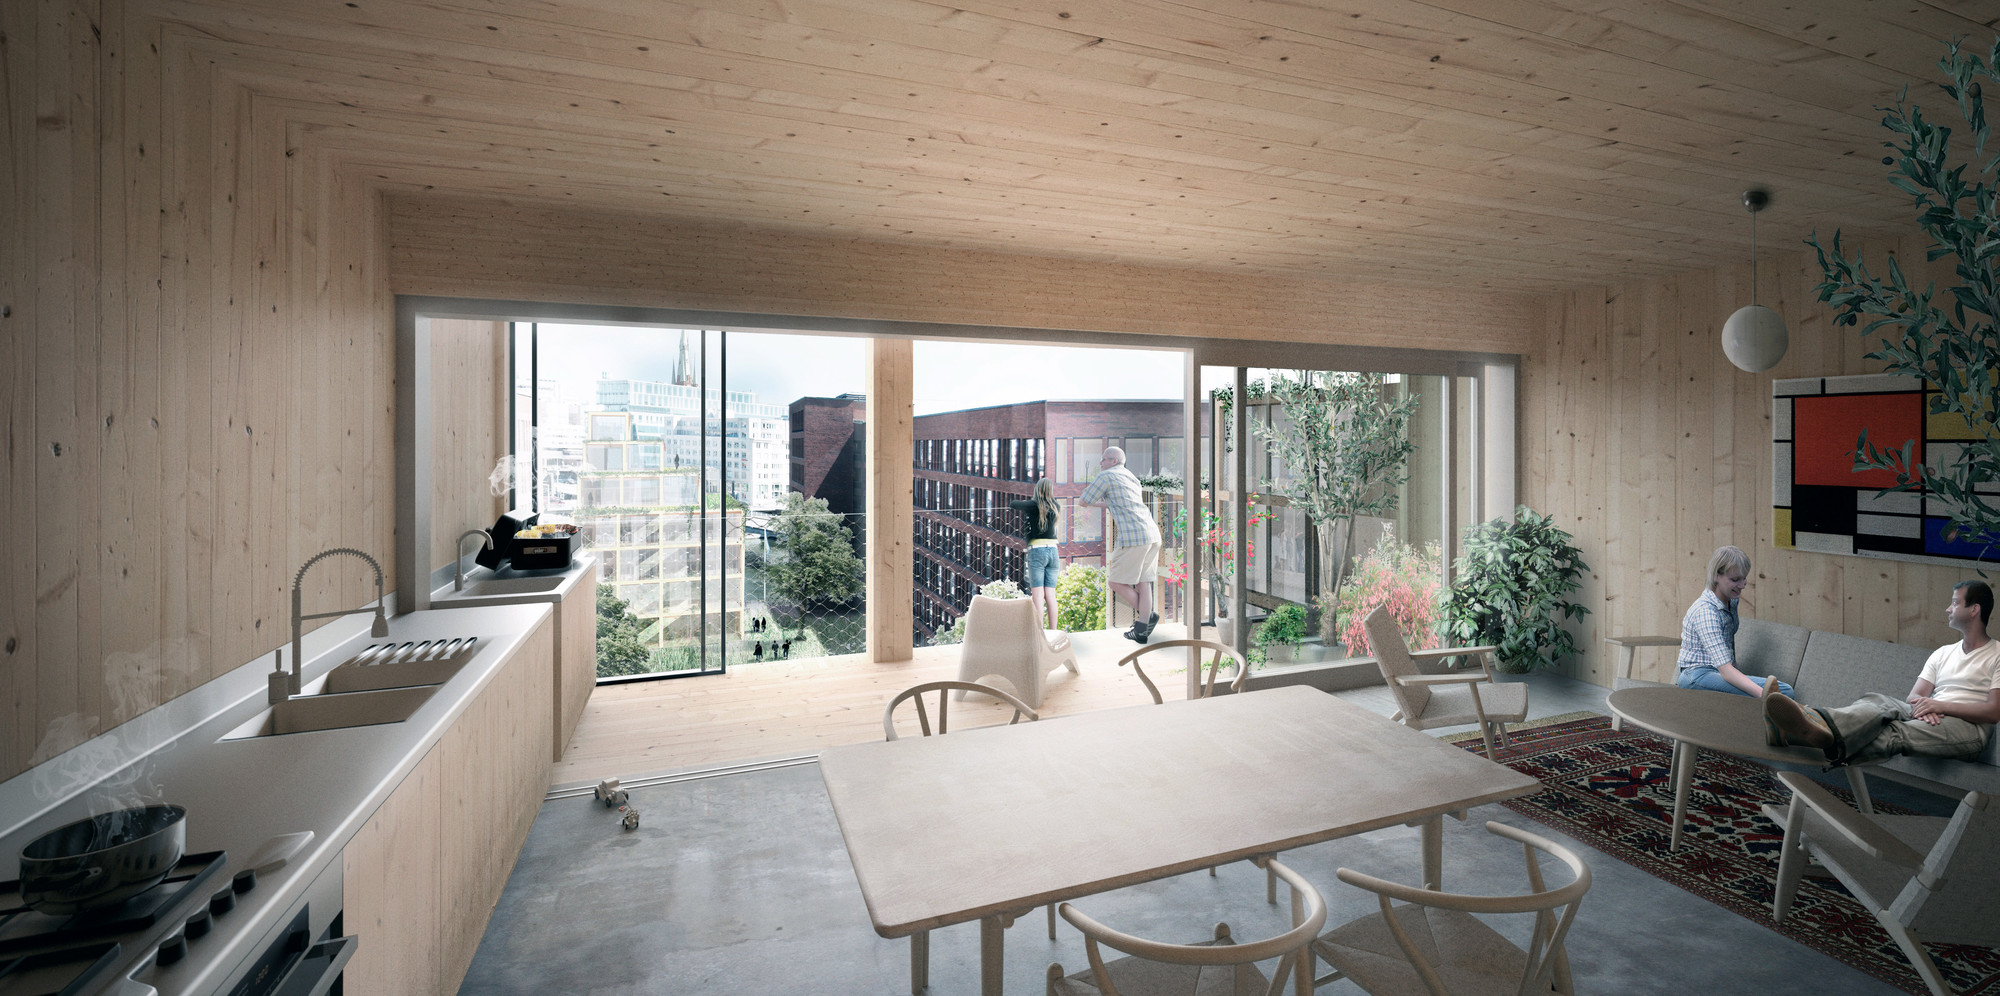 Great C.F. Møller And DinnellJohanssonu0027s Wooden Skyscraper Wins International  Competition Great Ideas